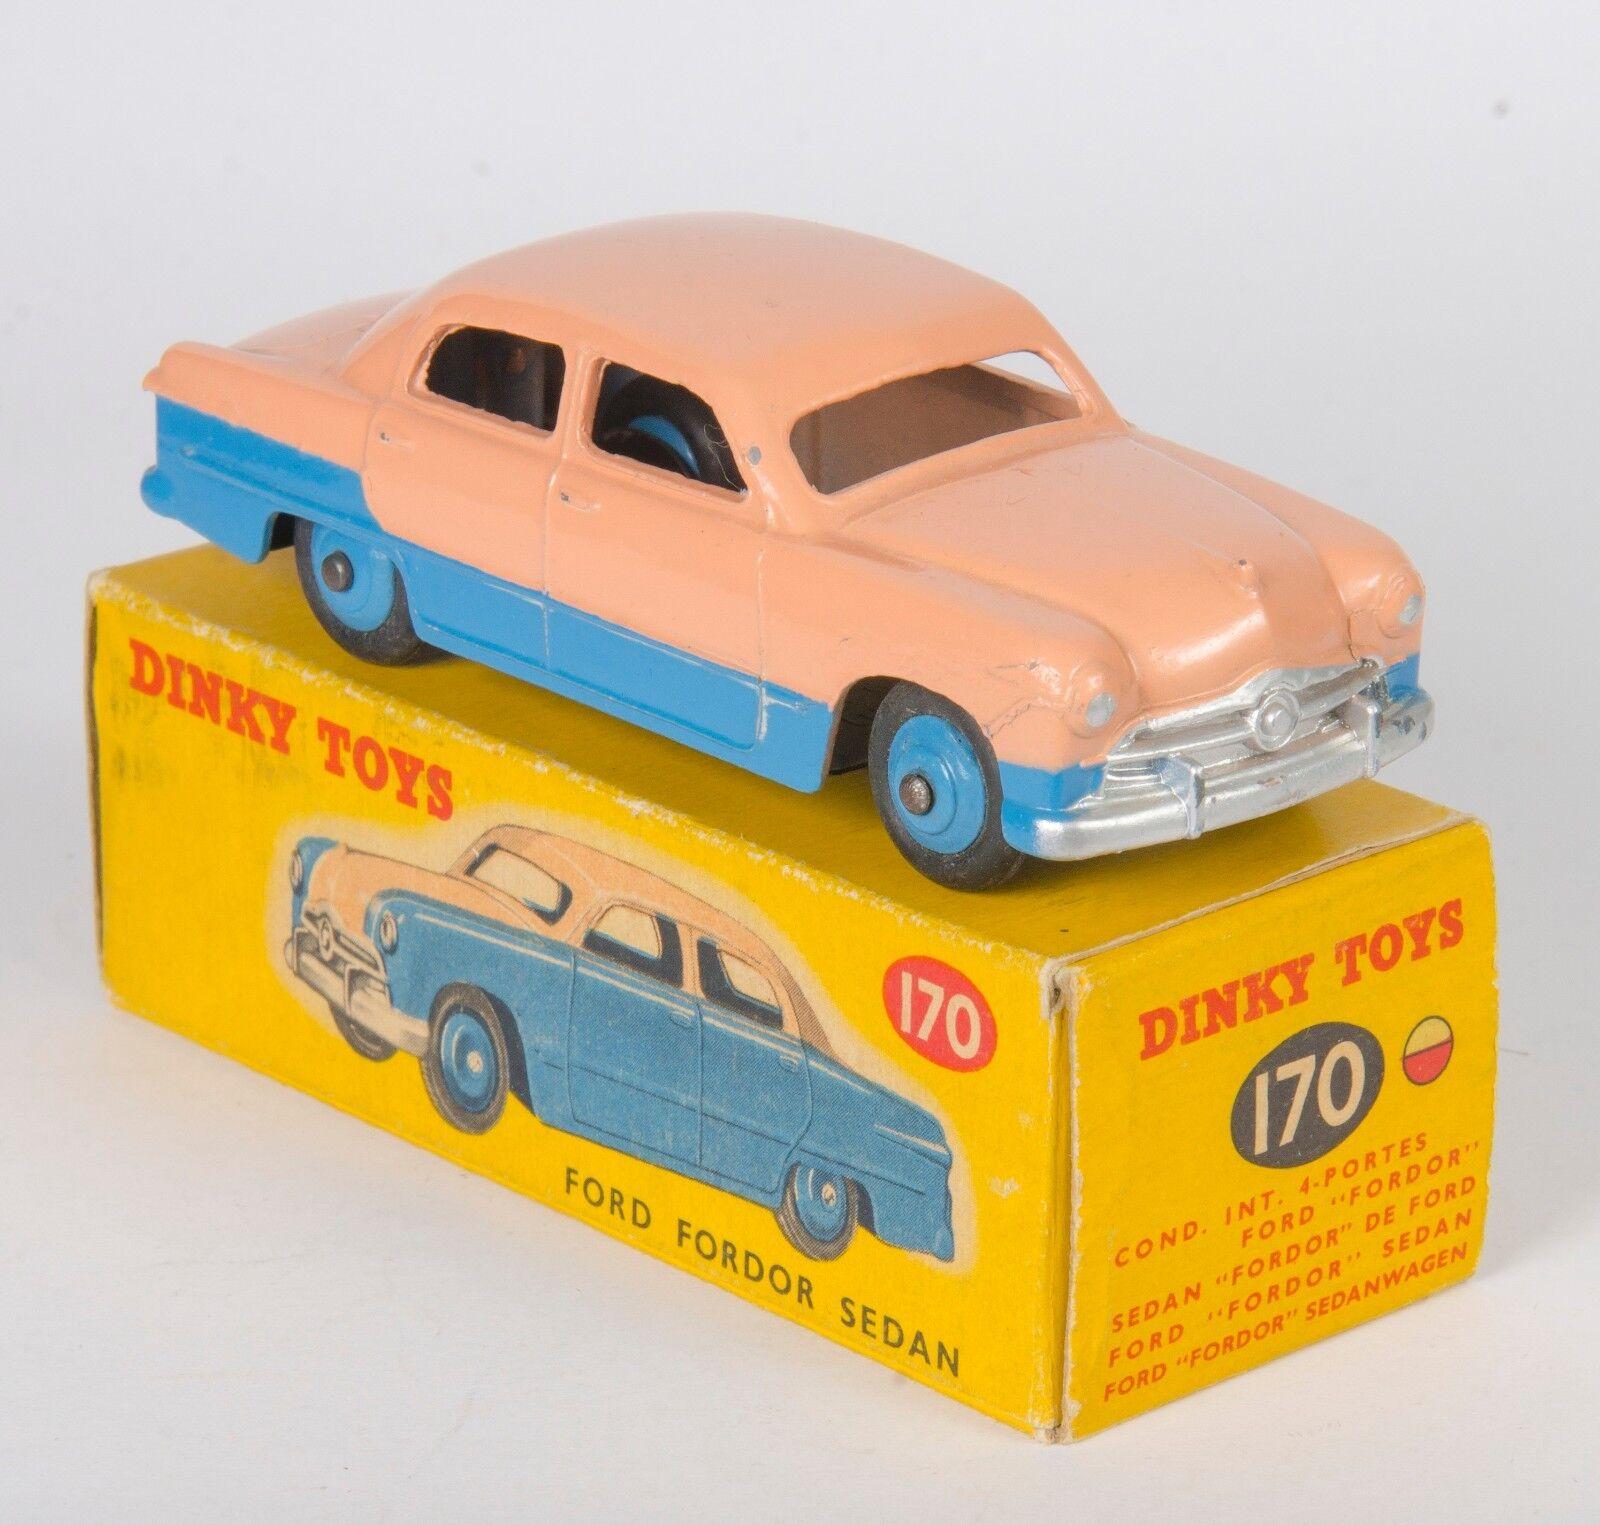 Dinky 170 Ford Fordor Sedan. Rare Low-Line bluee Salmon Upper. Original 1950s